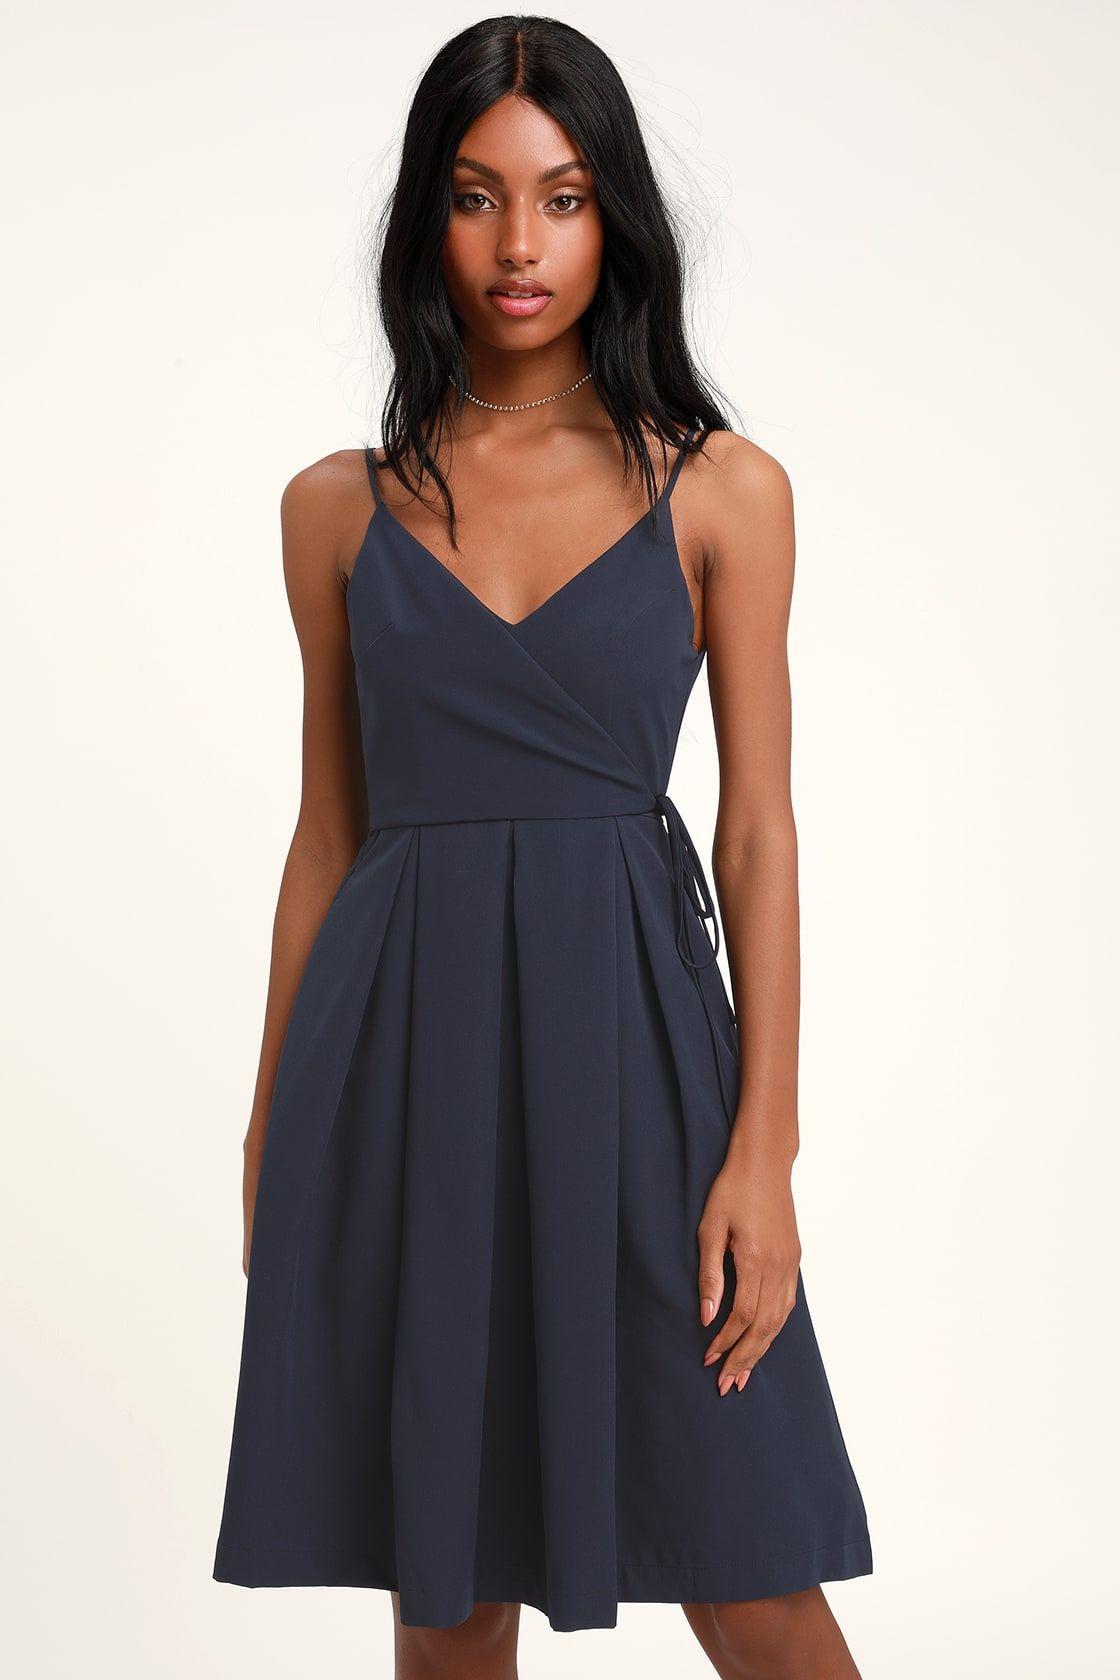 8bd276114b557 Cute Navy Blue Midi Dresses - raveitsafe